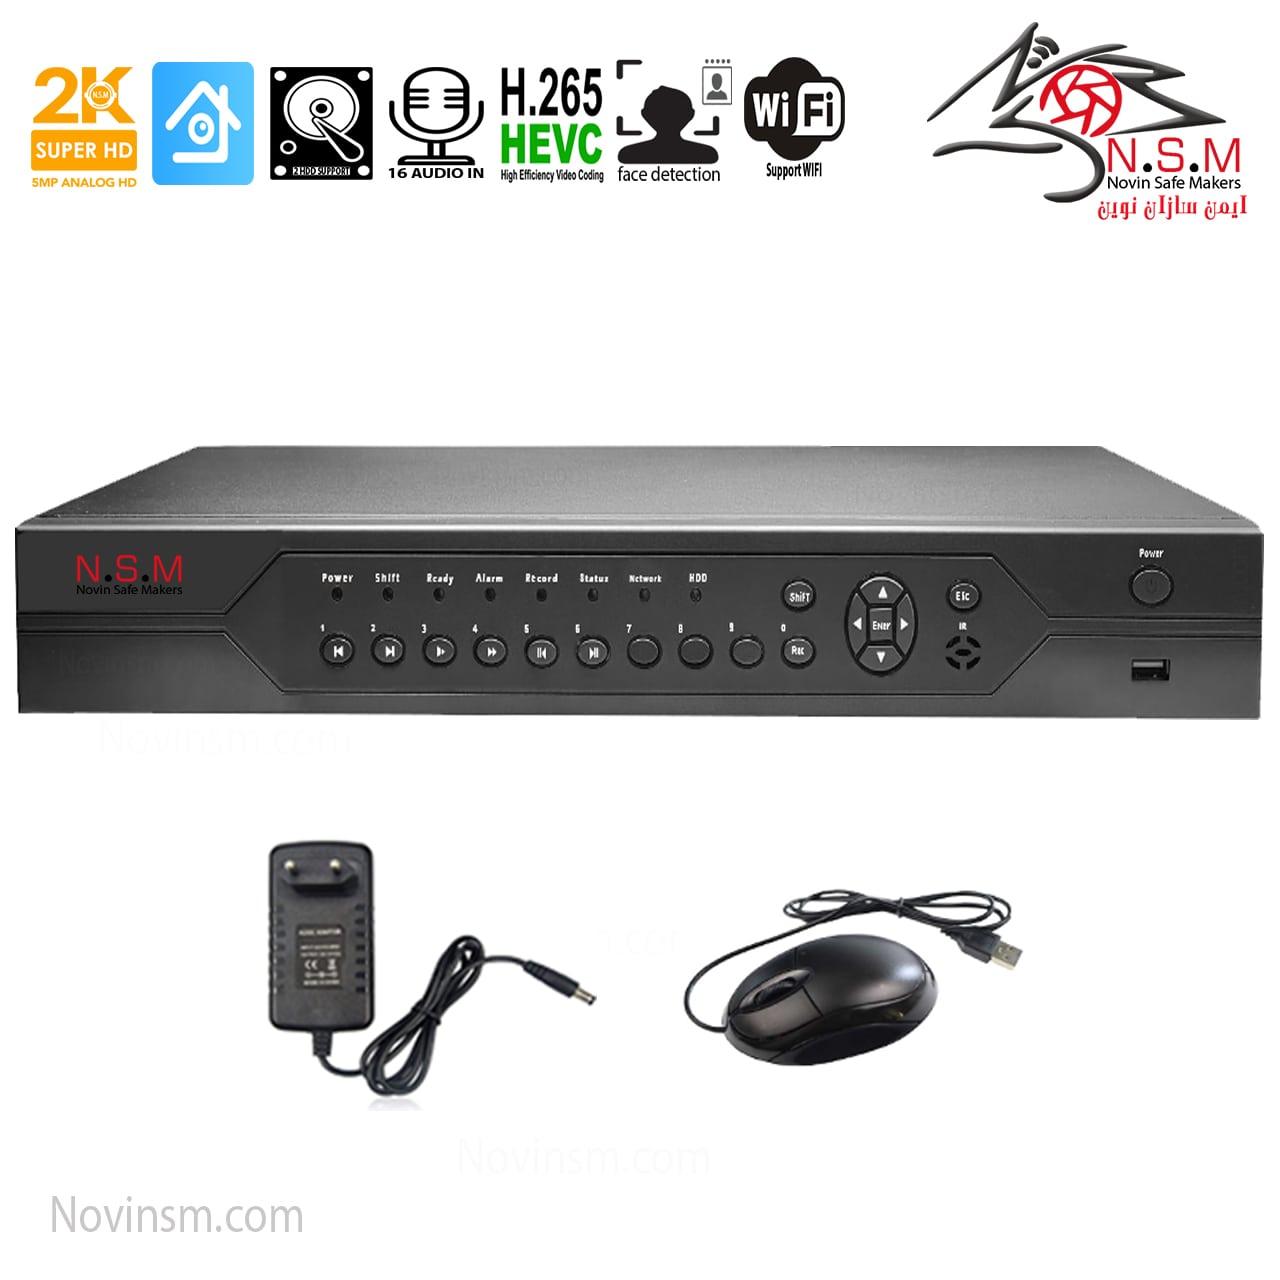 رکوردر 32 کانال 5 مگاپیکسل   دستگاه ضبط 32 کانال 2K